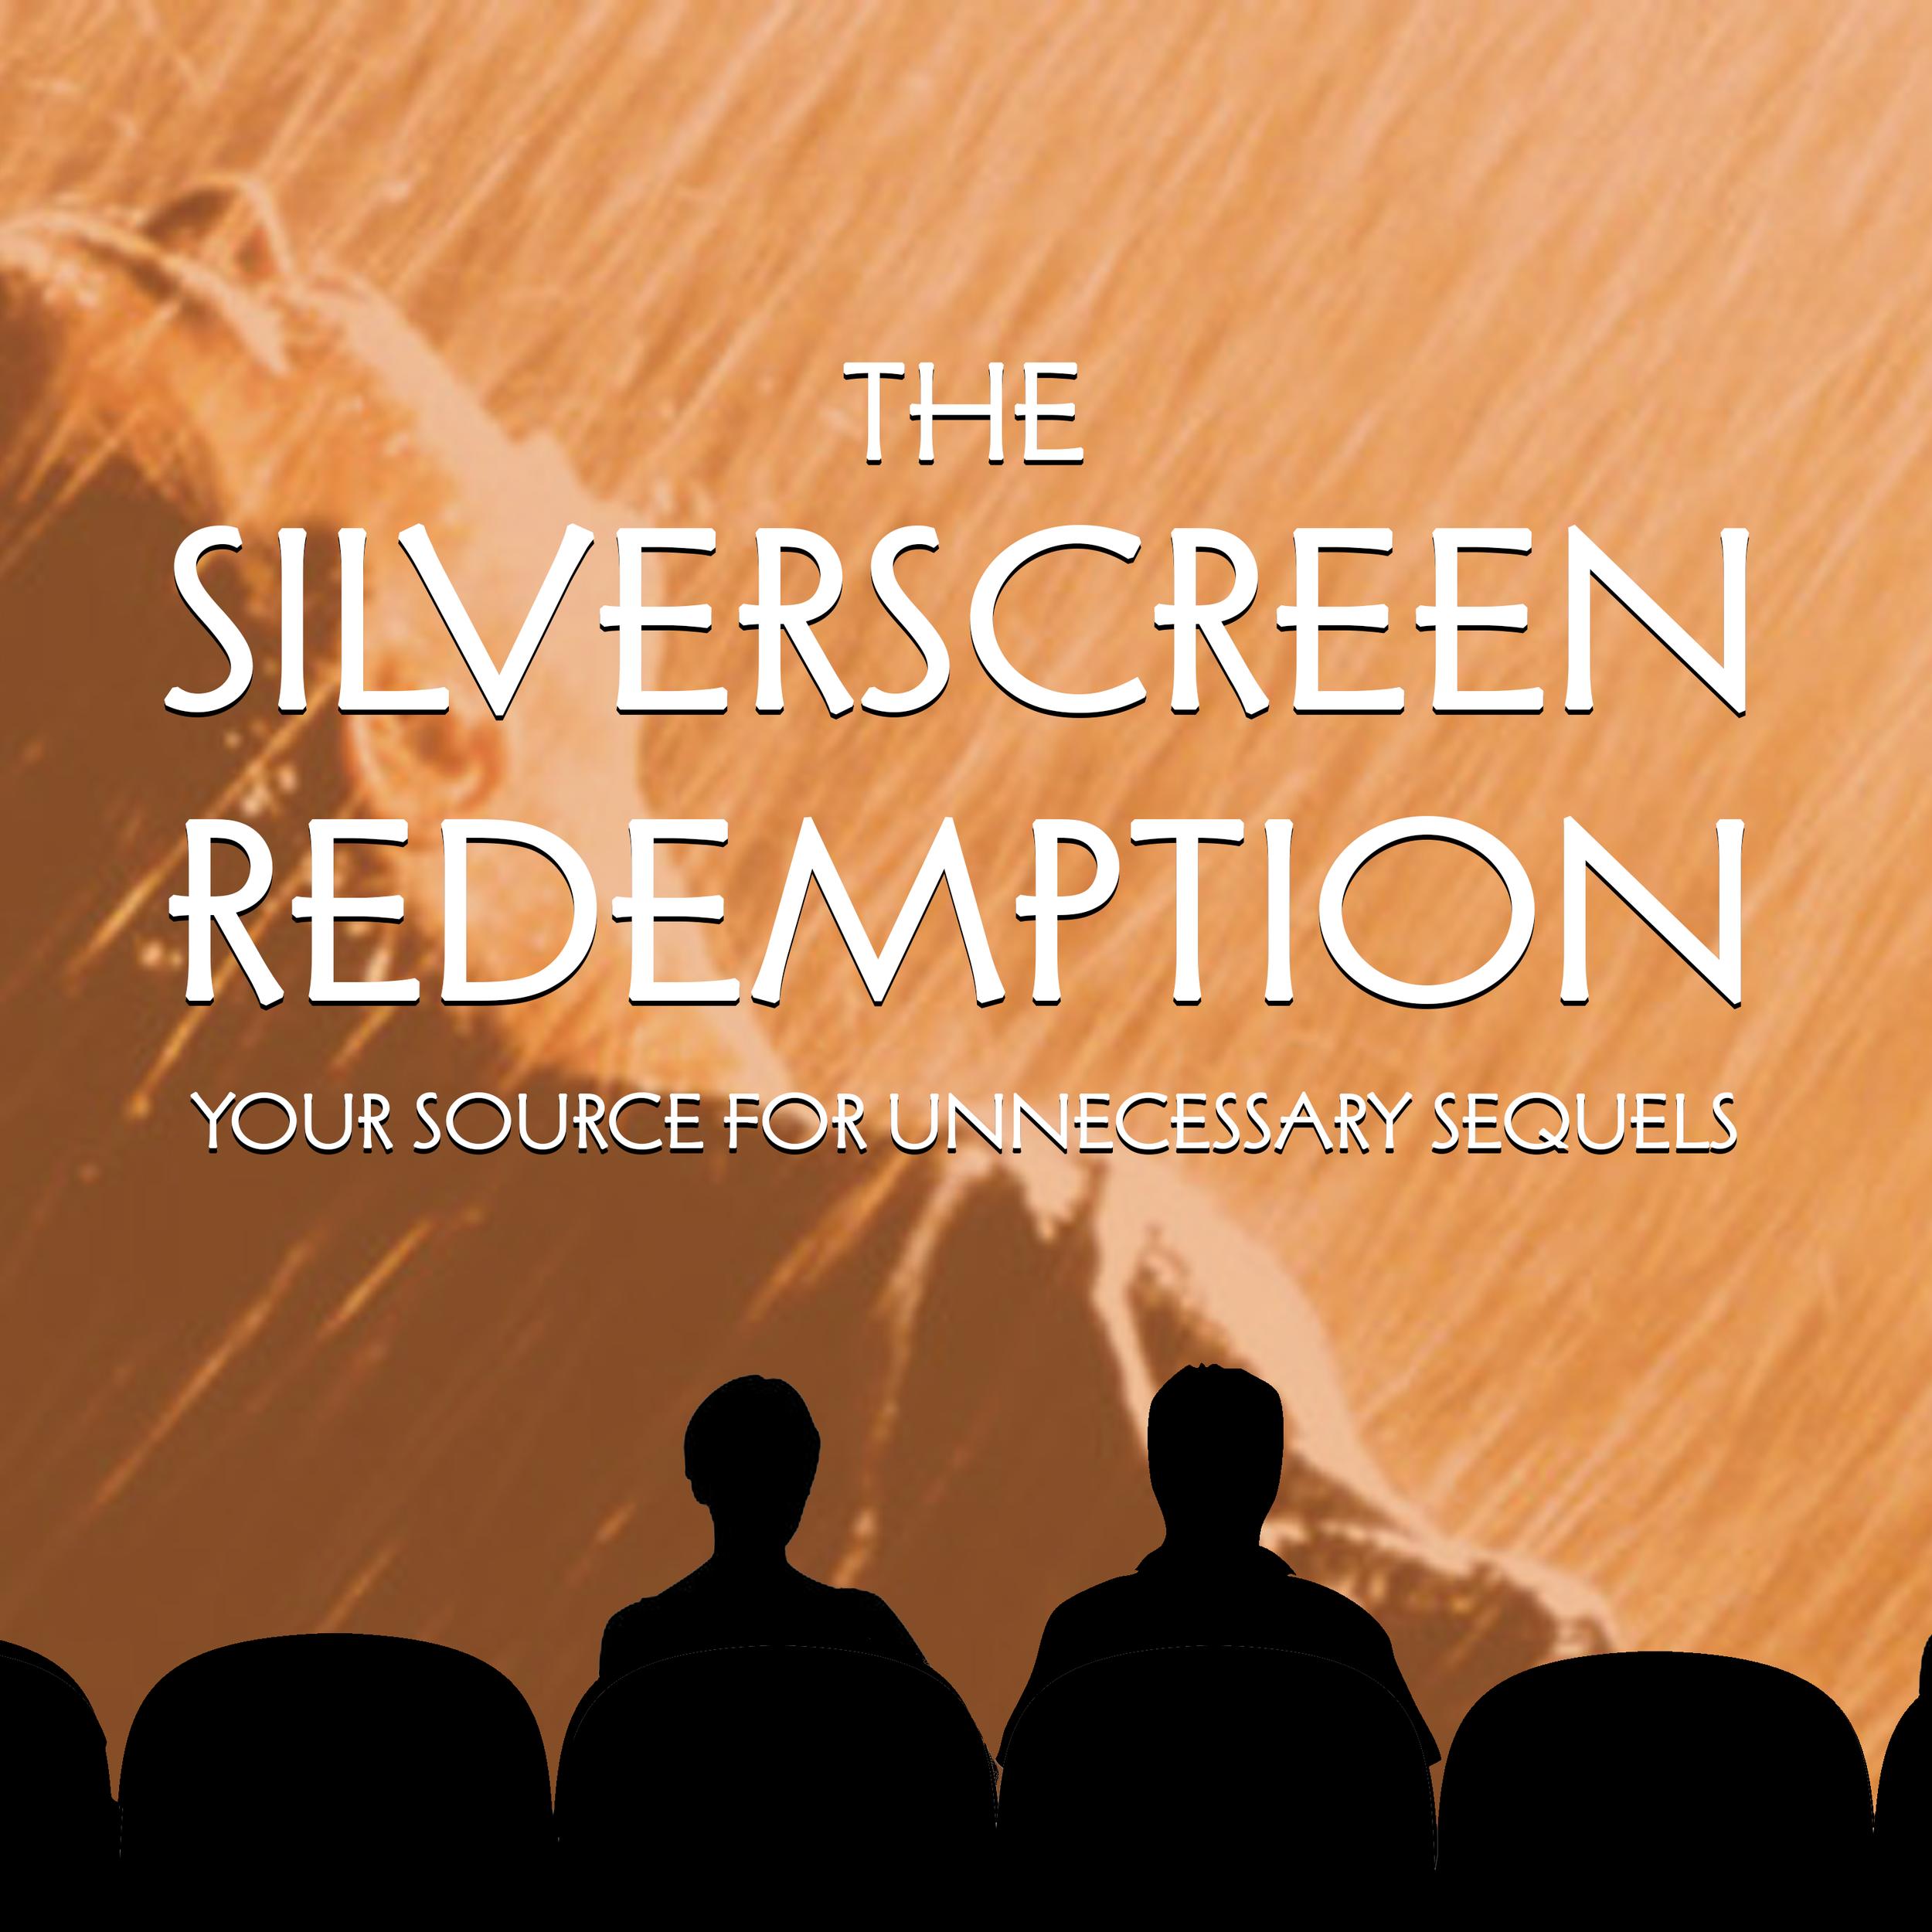 silverscreen_redemption.png